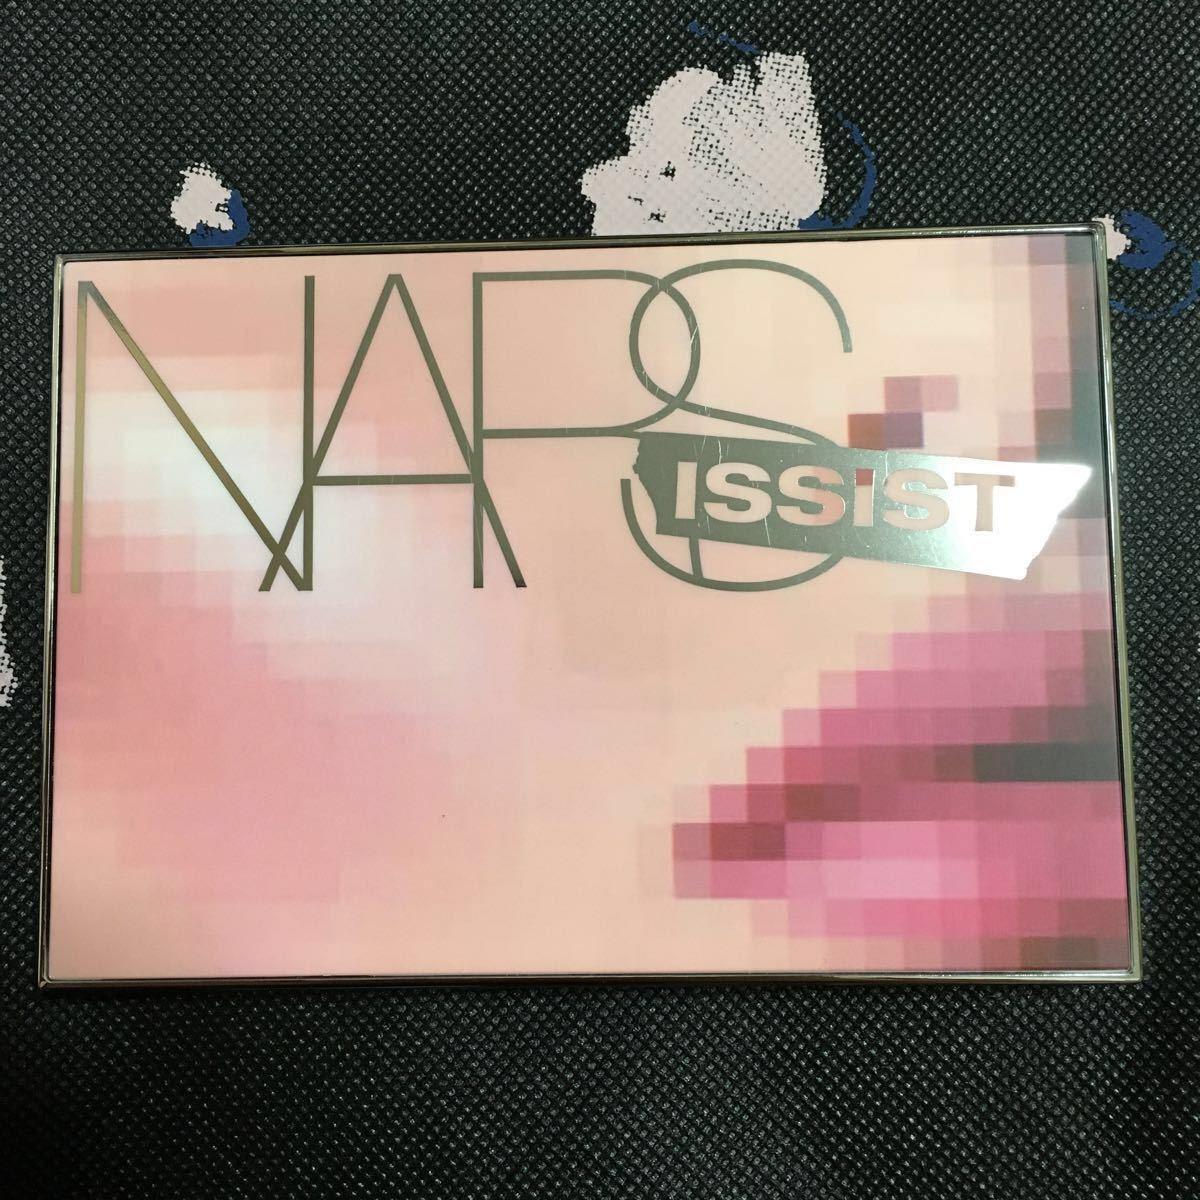 NARS ナーズイストウォンテッド チークパレット1 限定品 _画像3